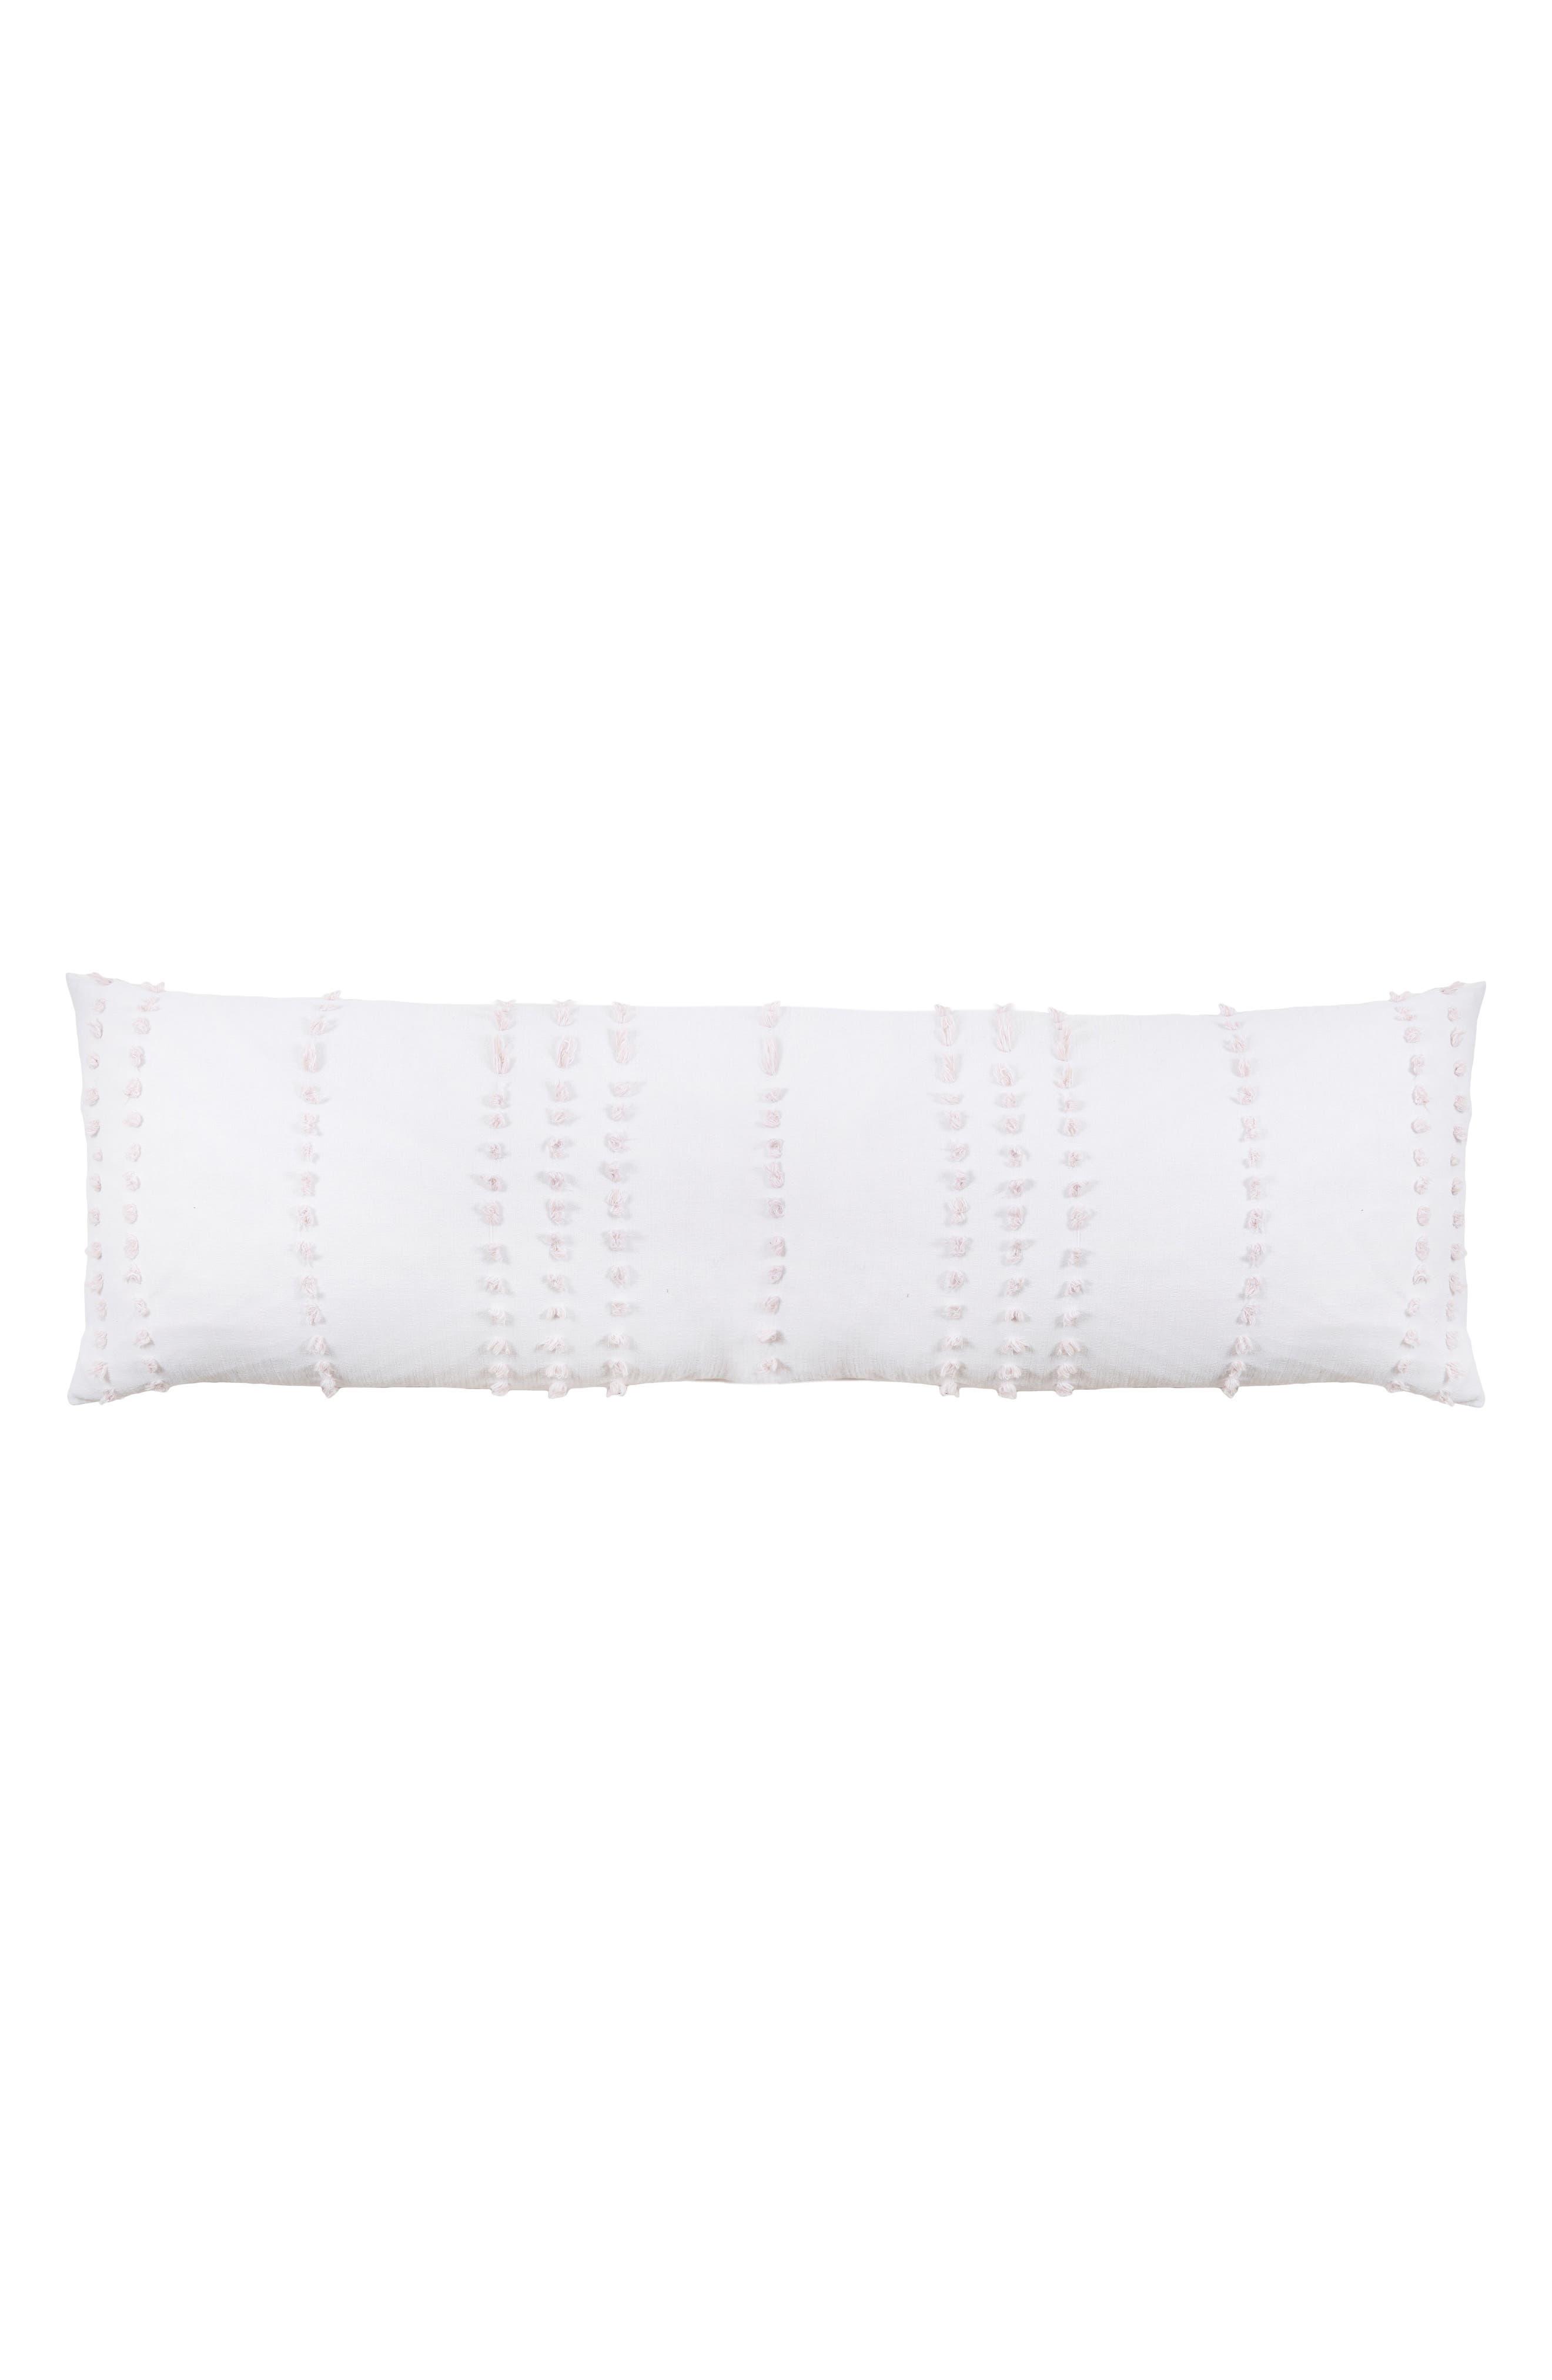 POM POM AT HOME Poppy Body Pillow, Main, color, WHITE/ BLUSH